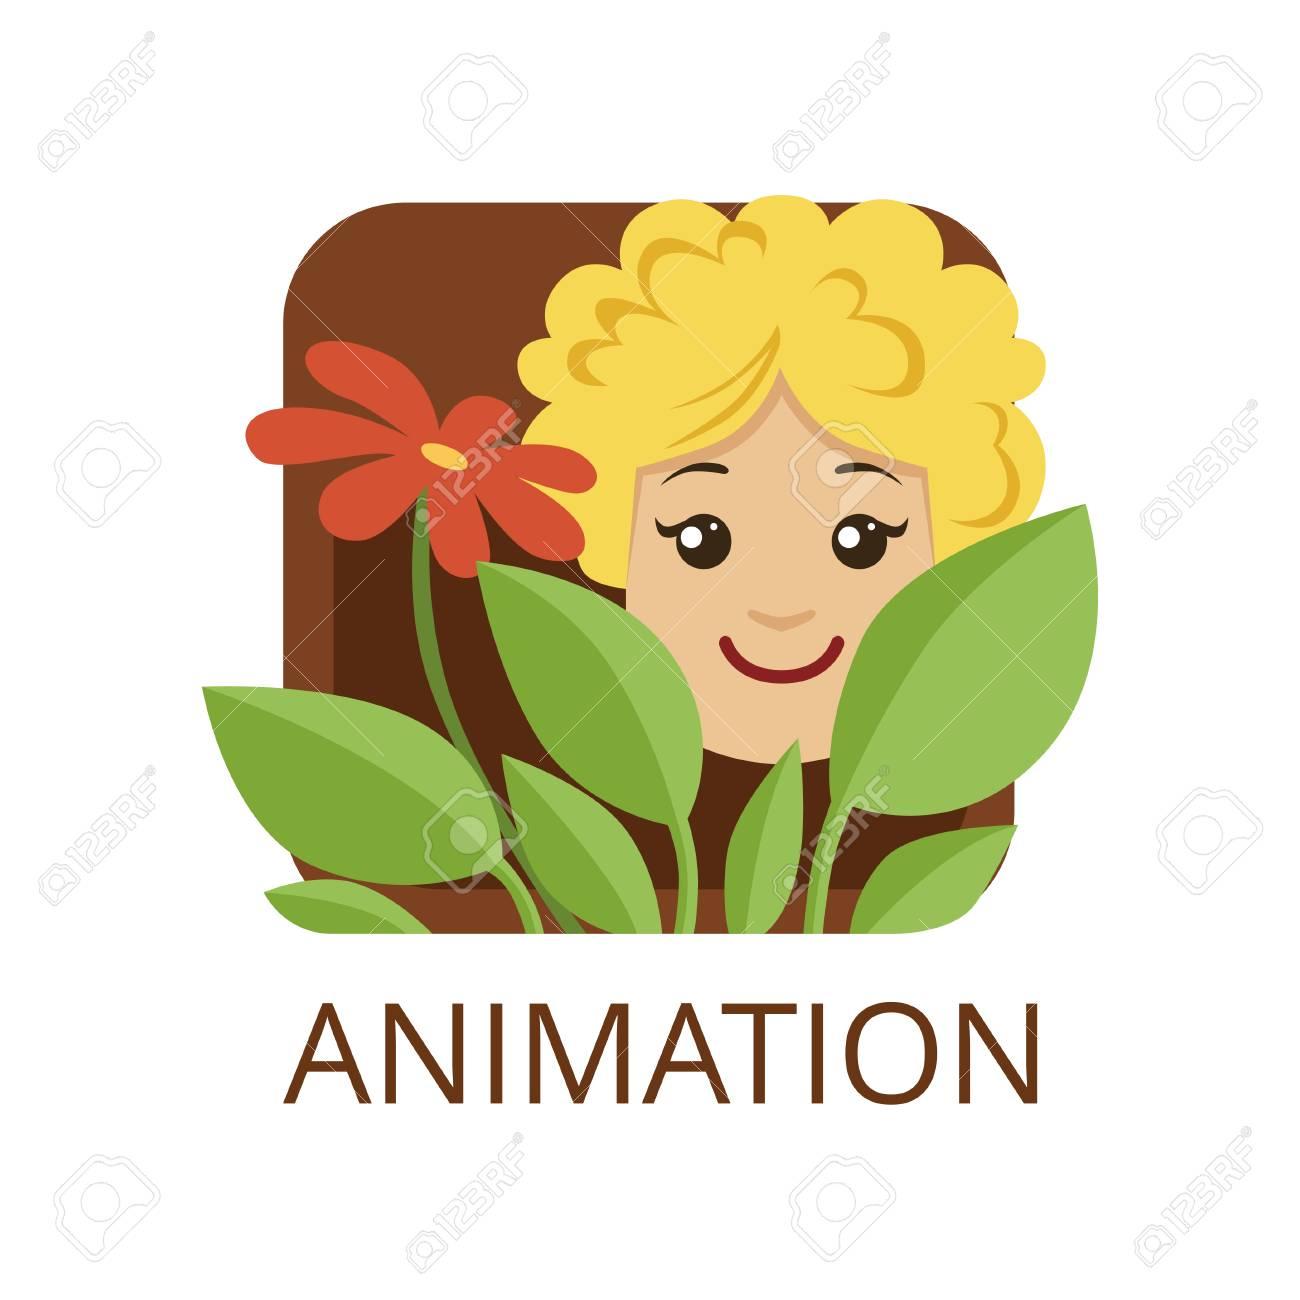 Animation cinema genre symbol for cinema or channel animation cinema genre symbol for cinema or channel cinematography movie production illustration biocorpaavc